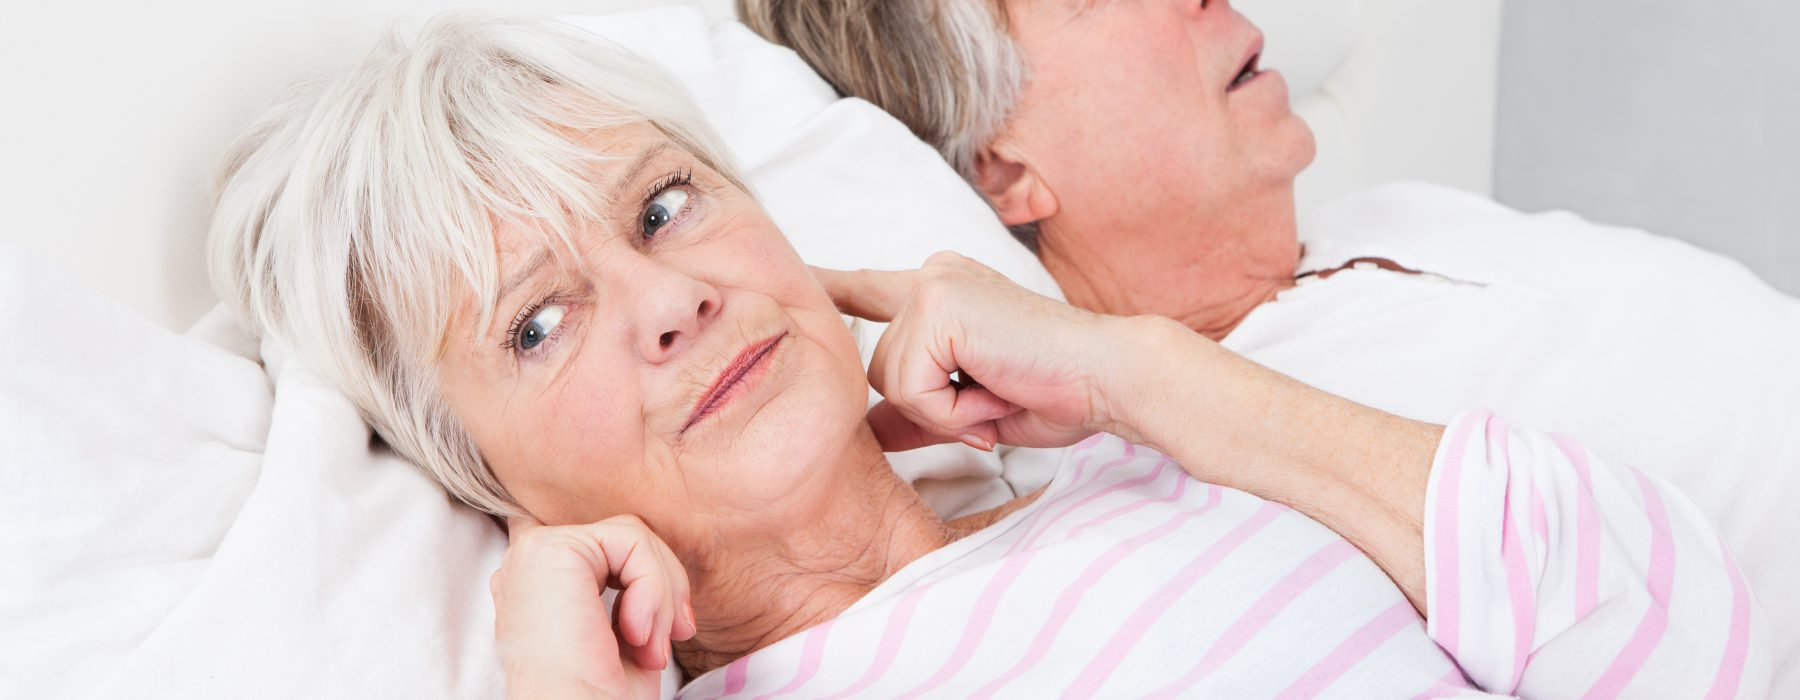 apnea of the dream and snores